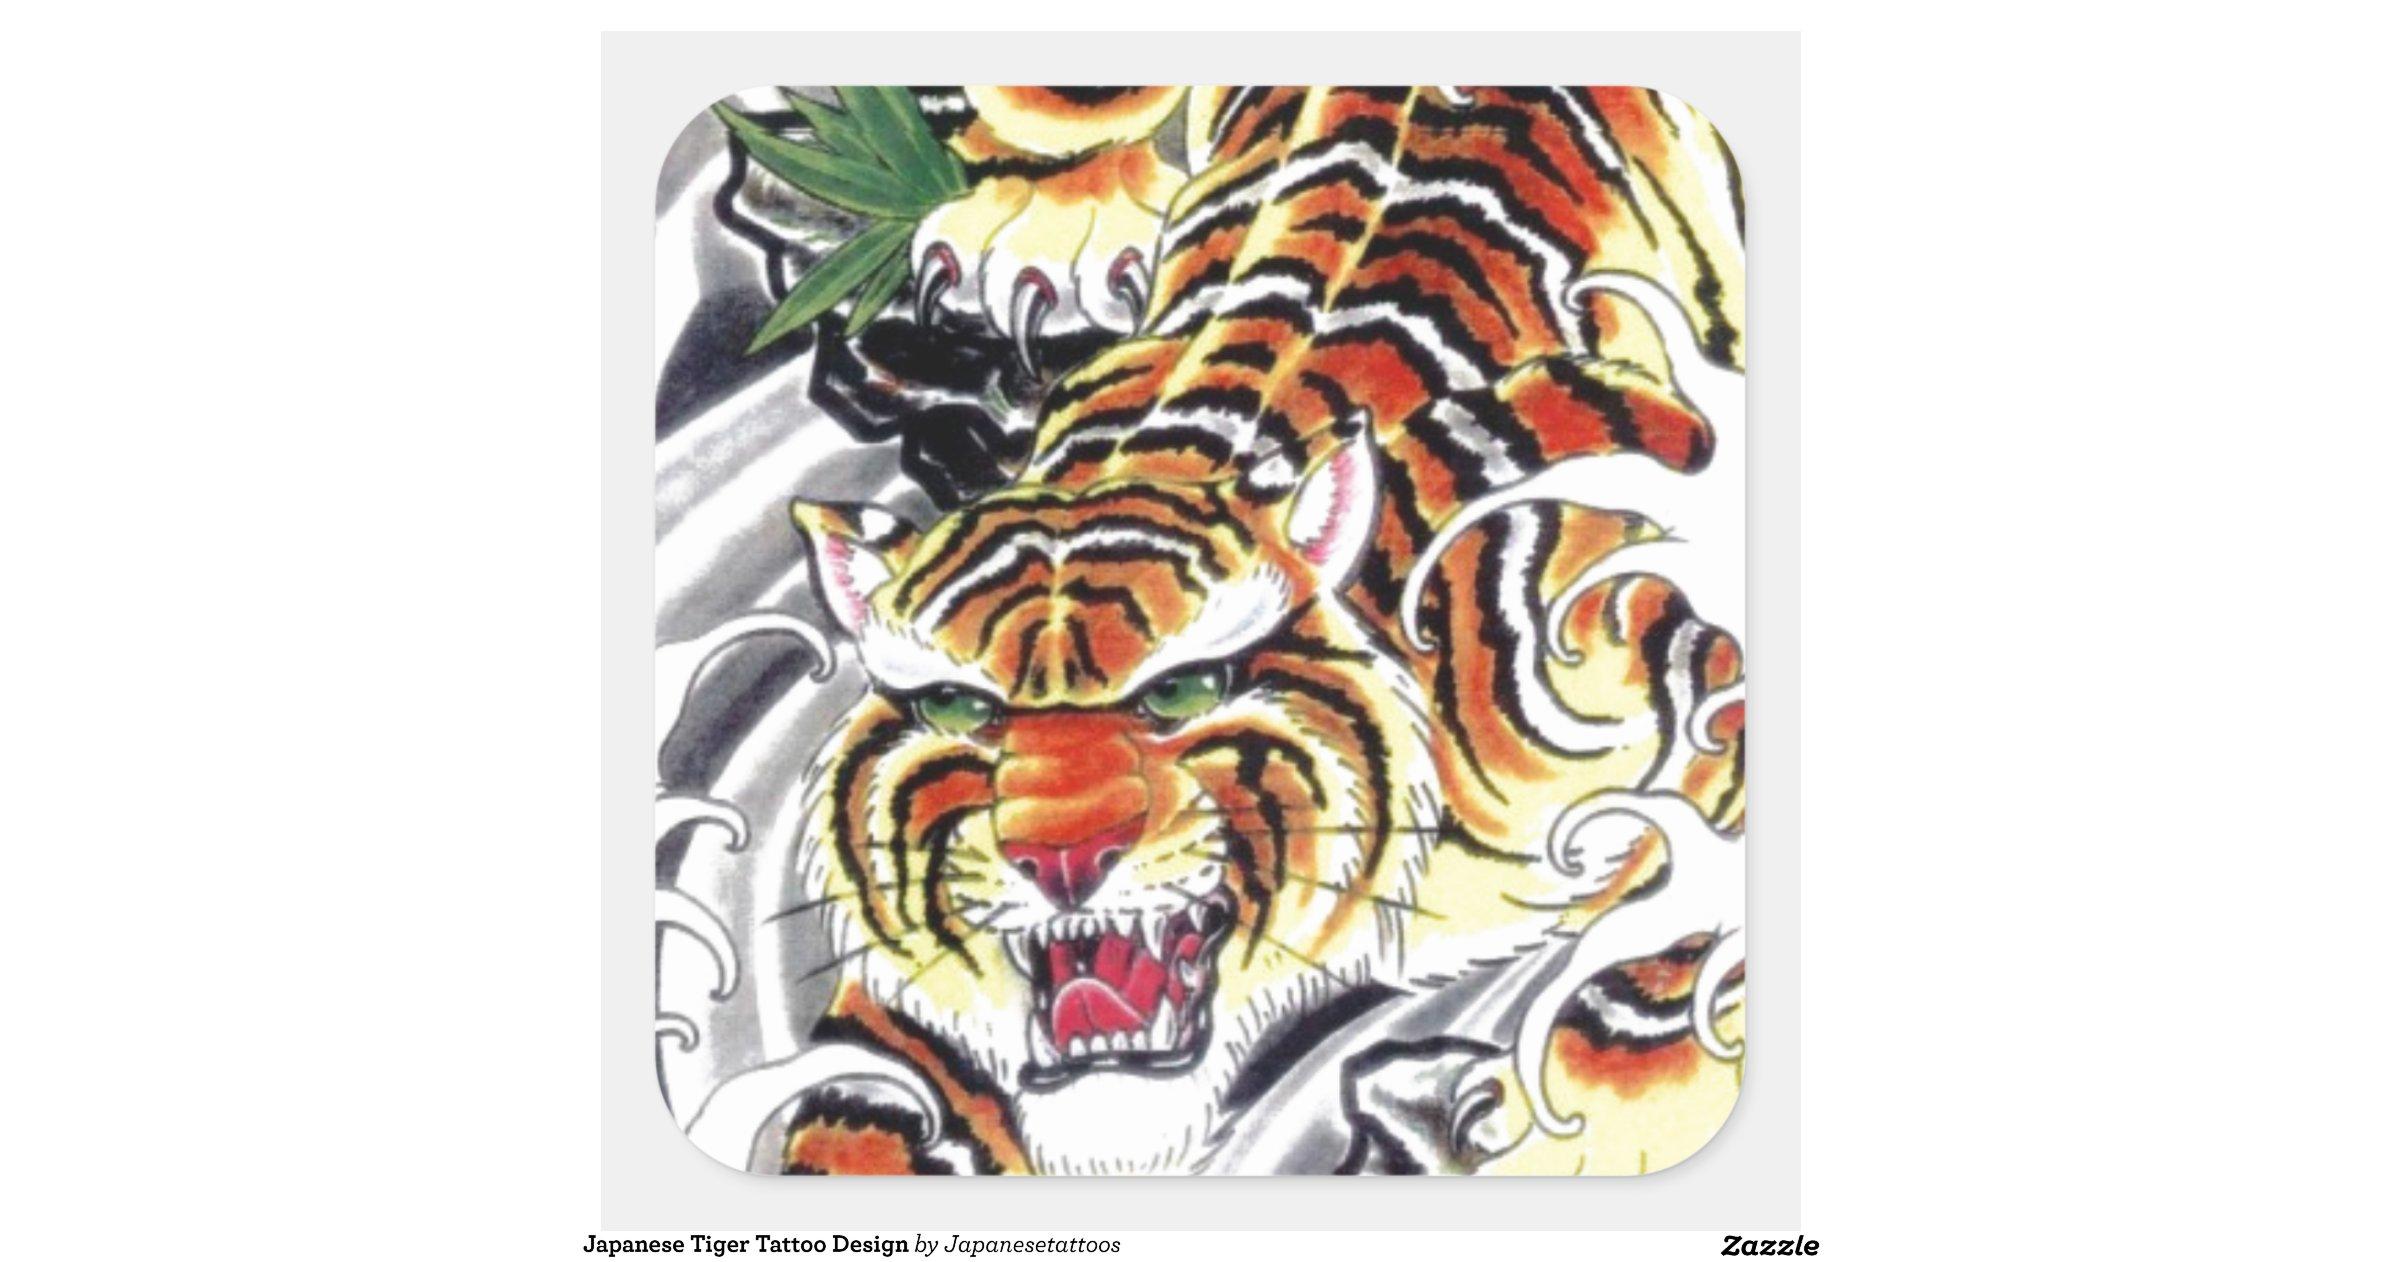 japanese tiger tattoo design square sticker zazzle. Black Bedroom Furniture Sets. Home Design Ideas